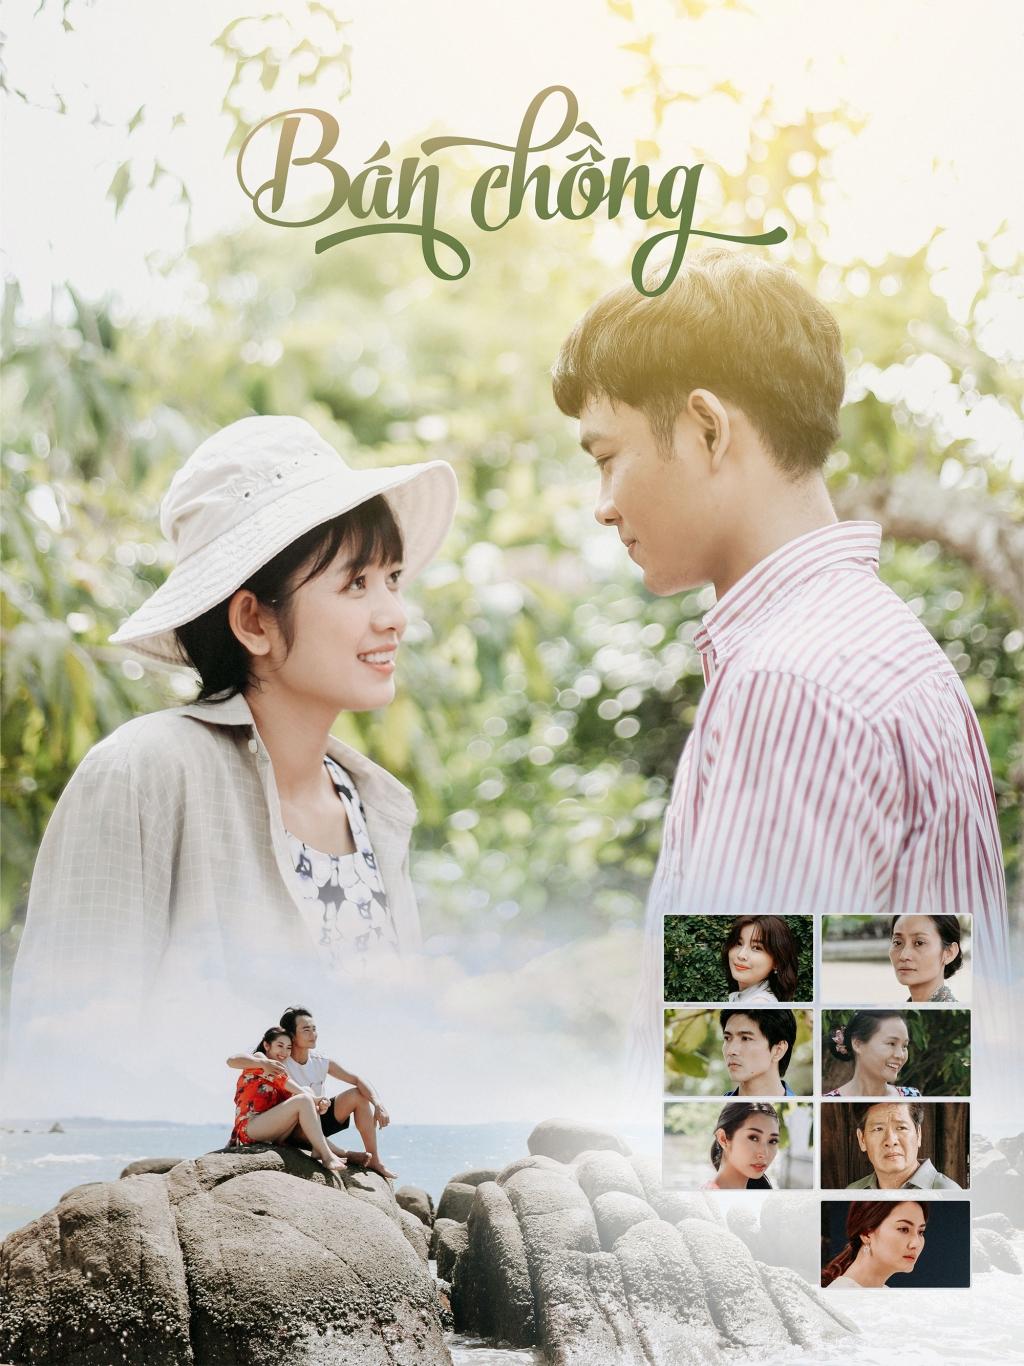 phim truyen hinh ban chong ve chu de gia dinh len song tren kenh vtv3